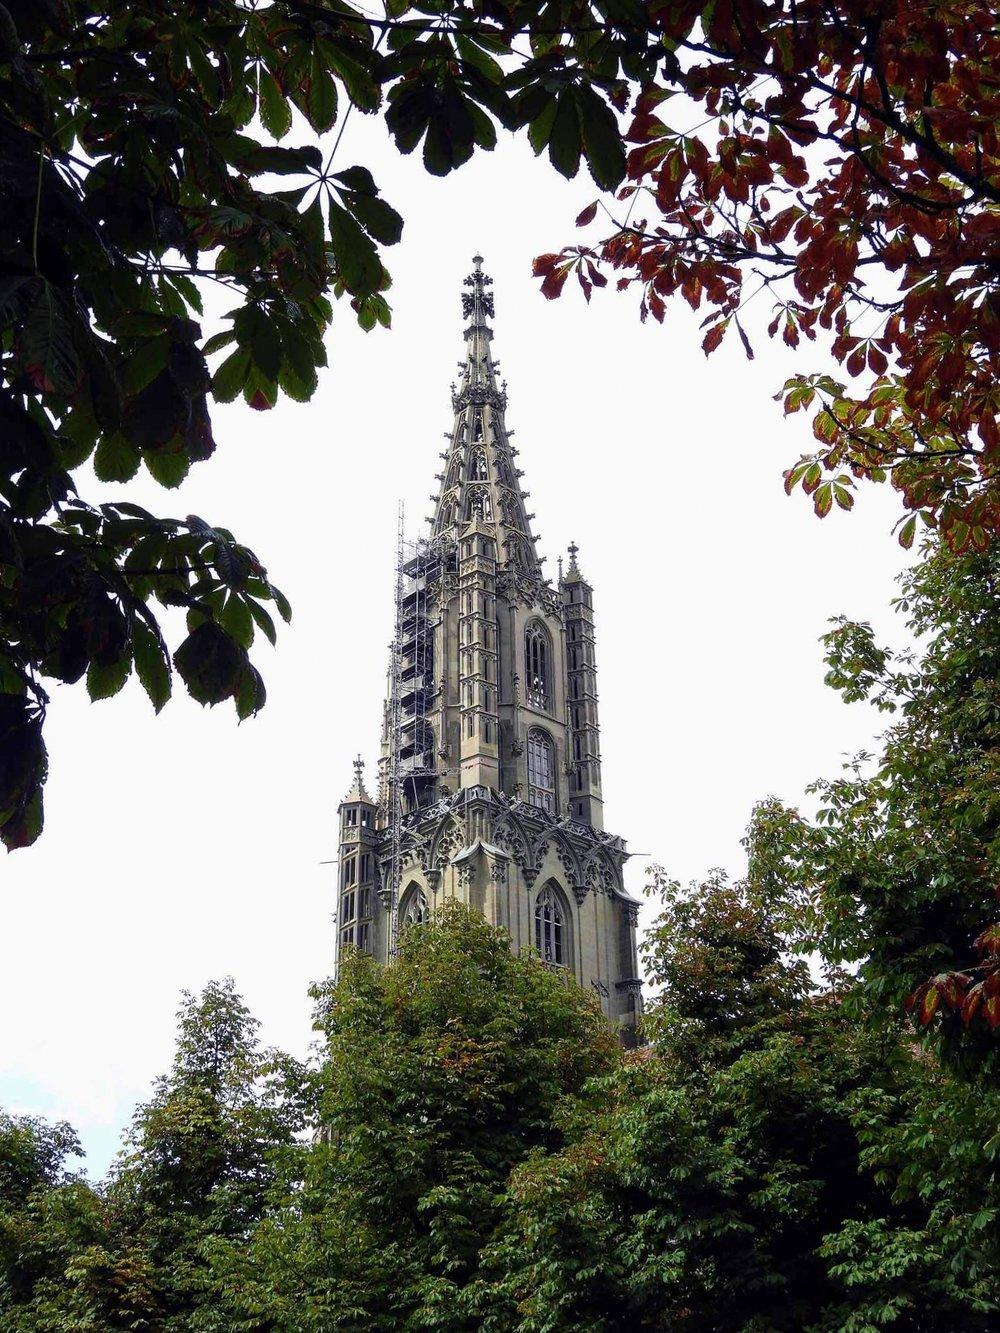 switzerland-bern-church-tower.jpg